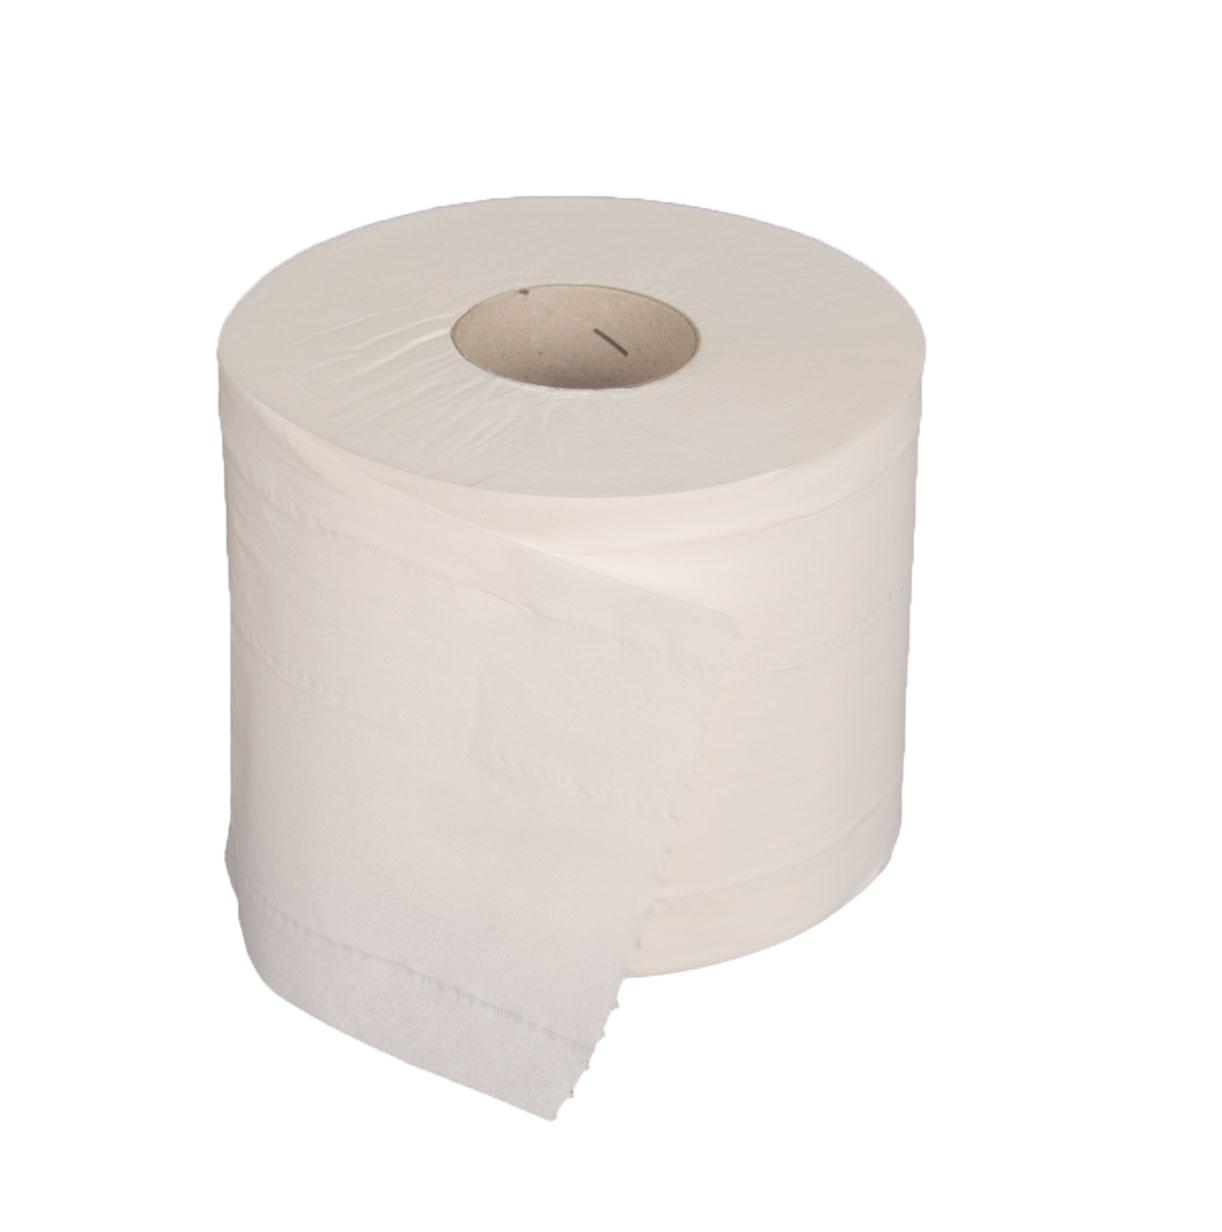 Toiletpapier 2-laags,centraal systeem